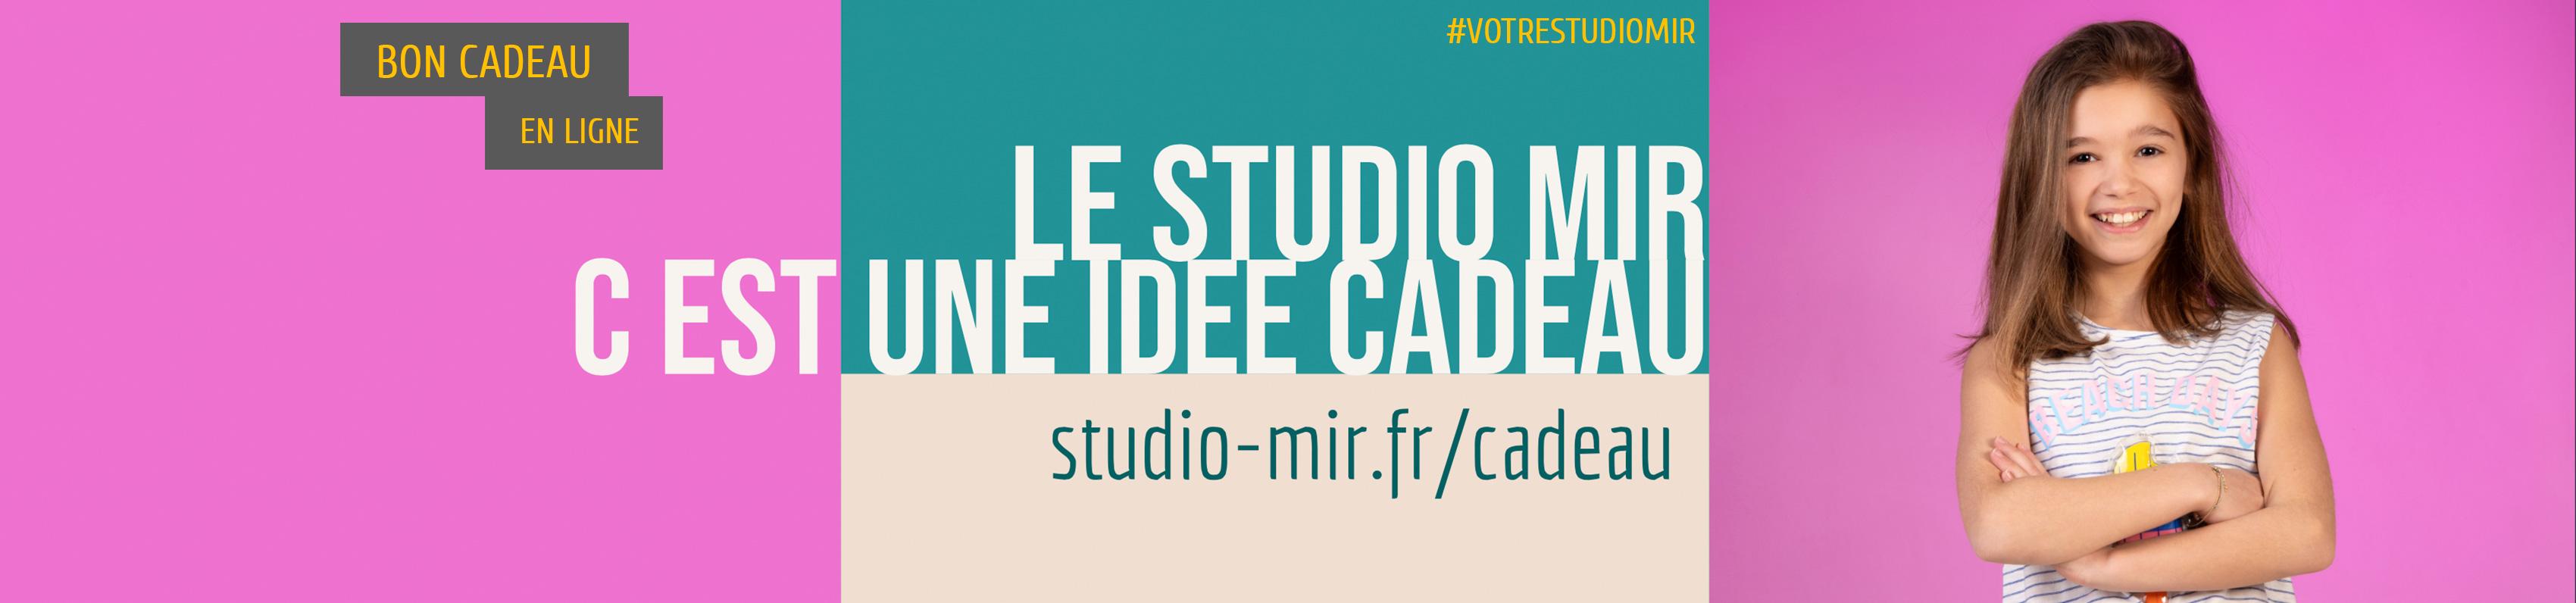 bon-cedeau-studio-shooting